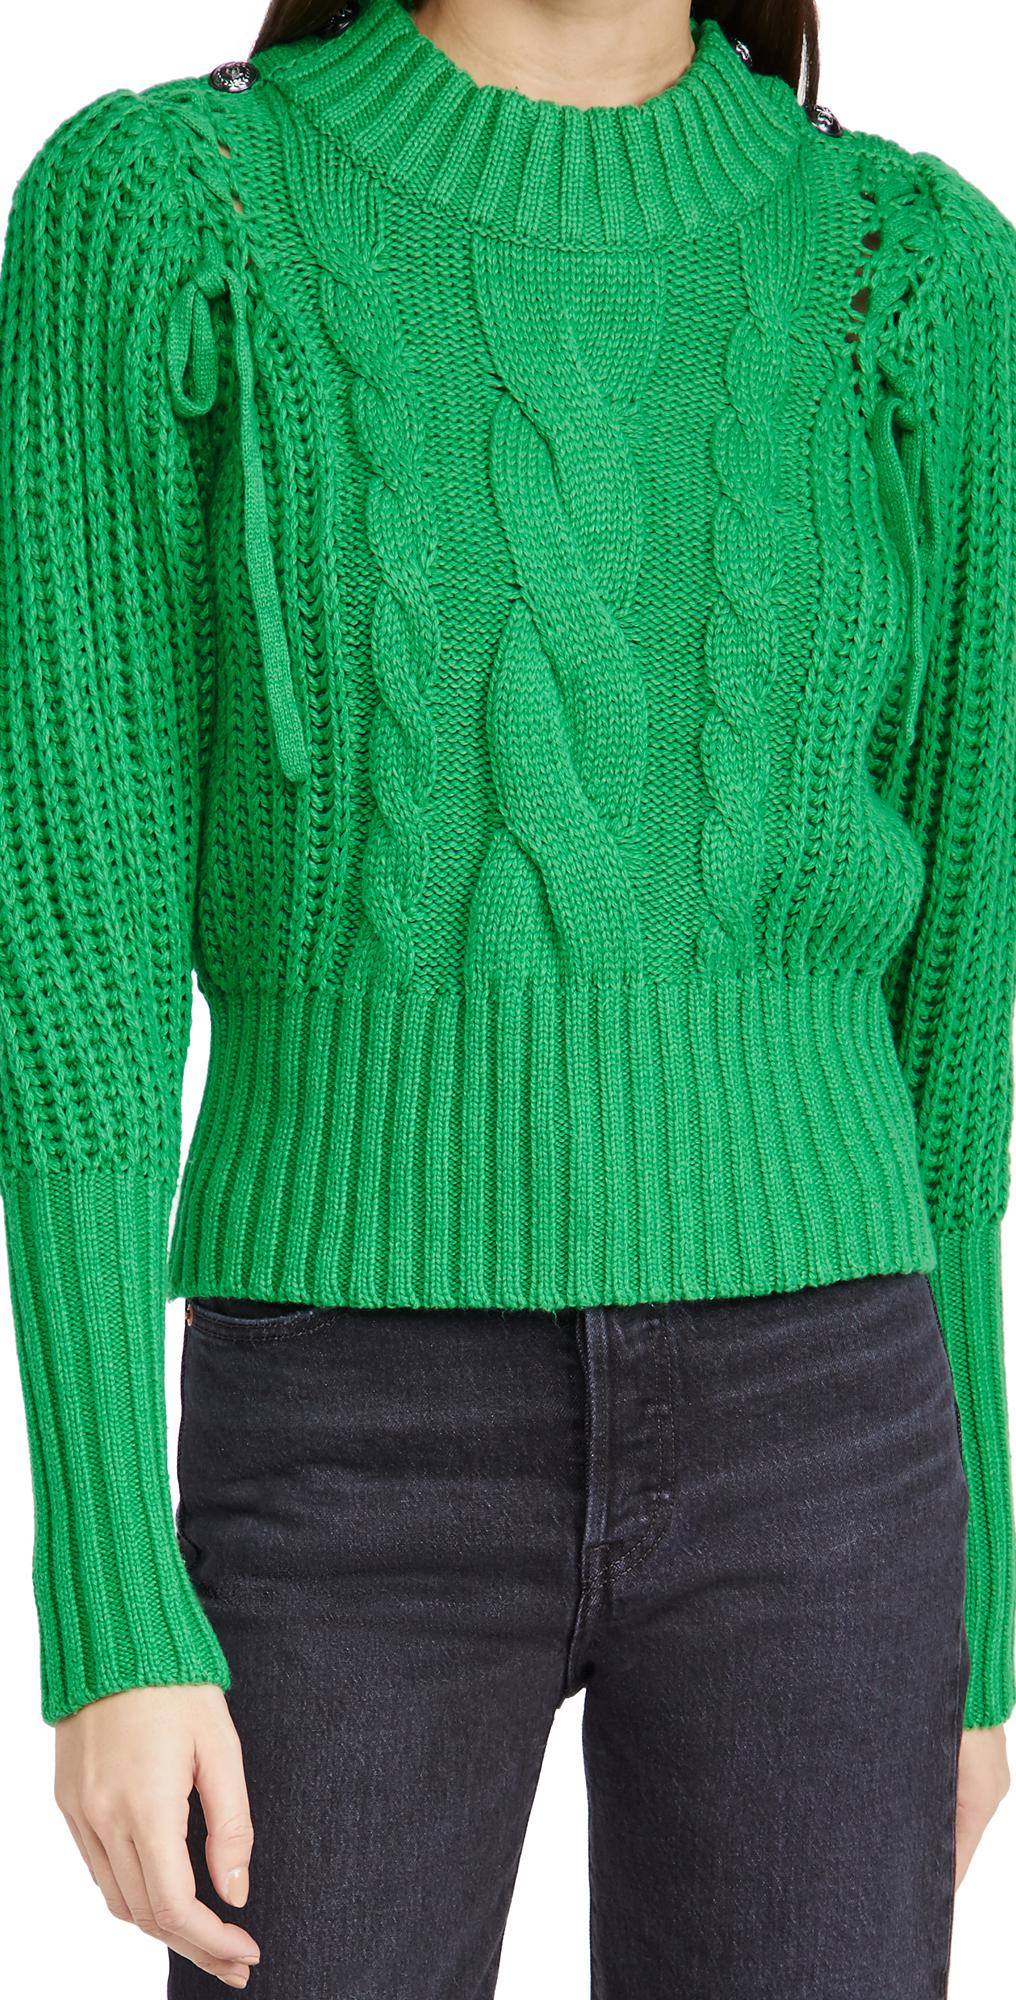 MUNTHE Turner Pullover Sweater